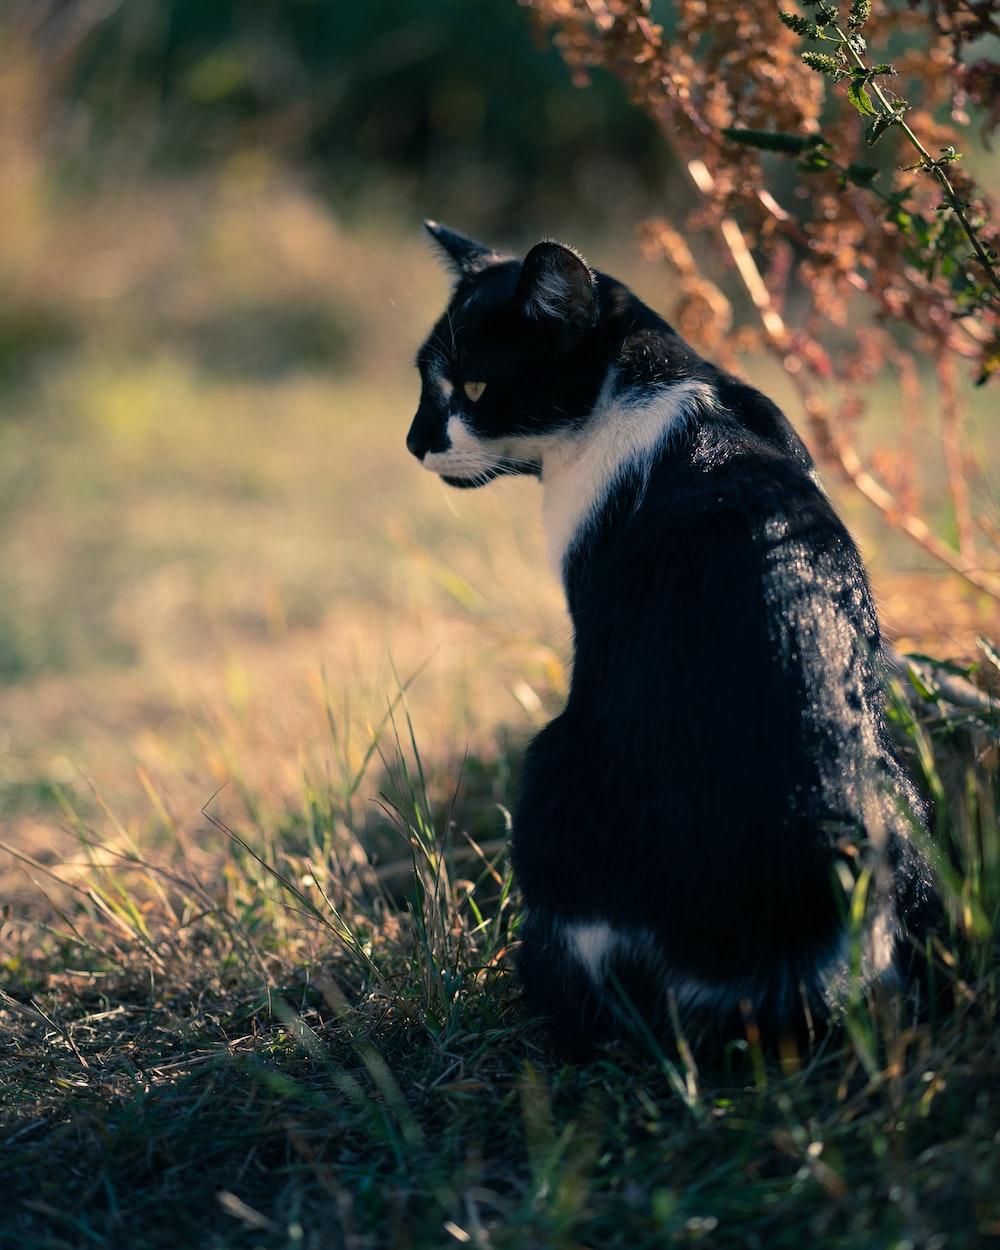 tuxedo cat on green grass field during daytime